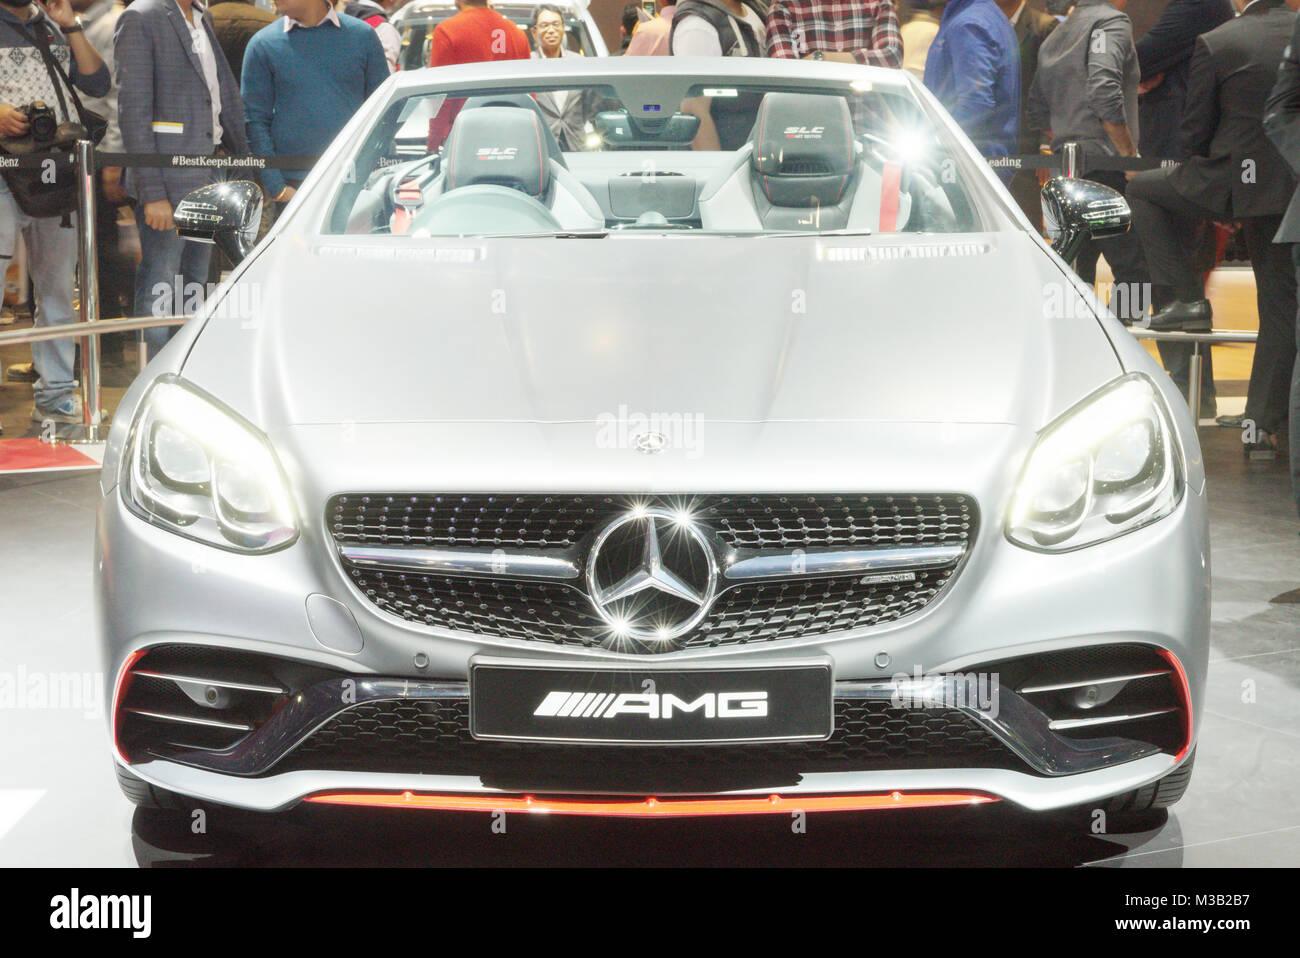 Auto Art Stockfotos & Auto Art Bilder - Alamy